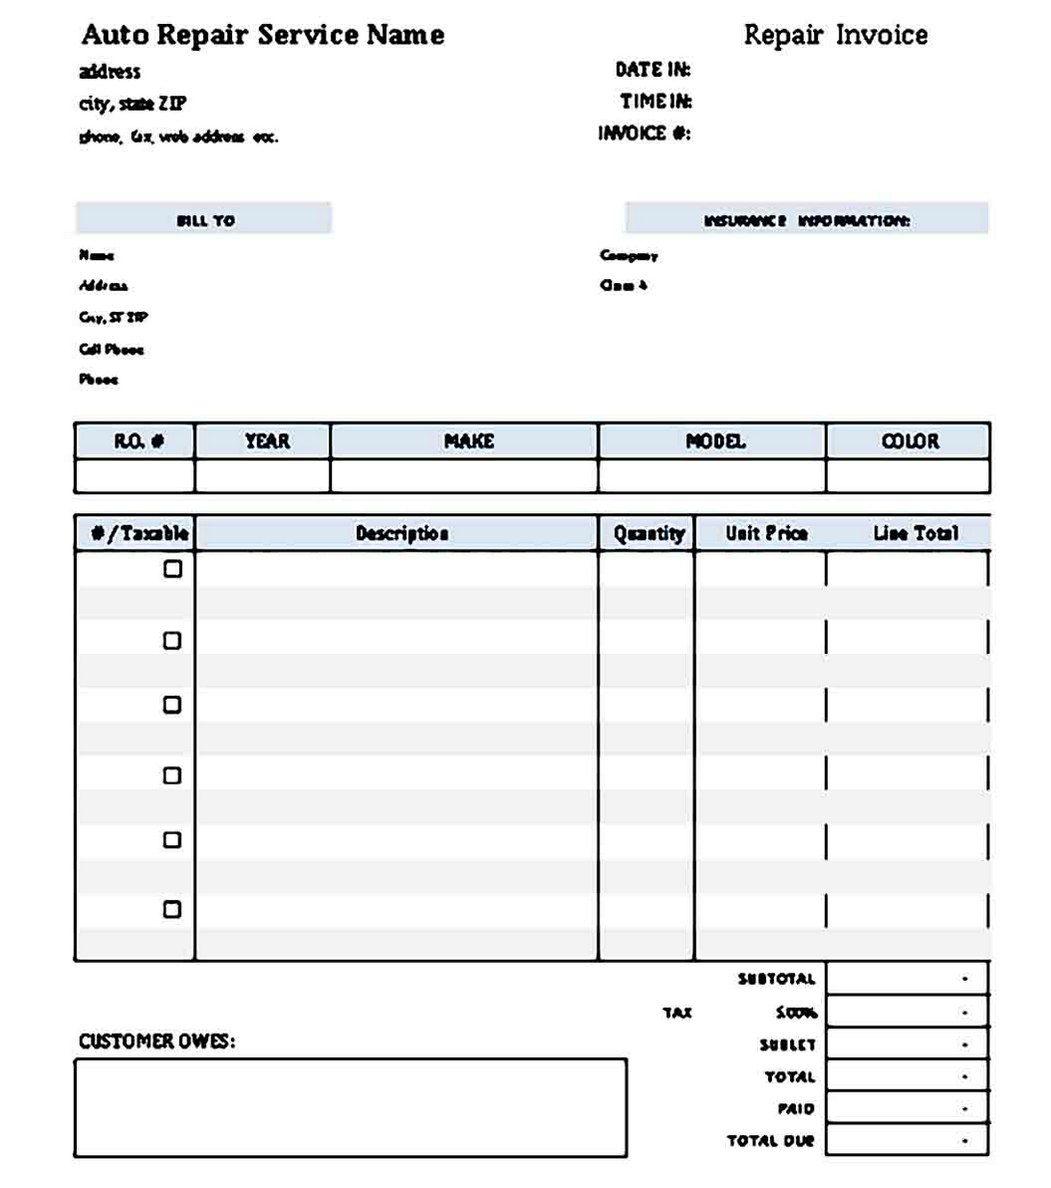 007 Phenomenal Auto Repair Order Template High Resolution  Work Free Automotive CarFull